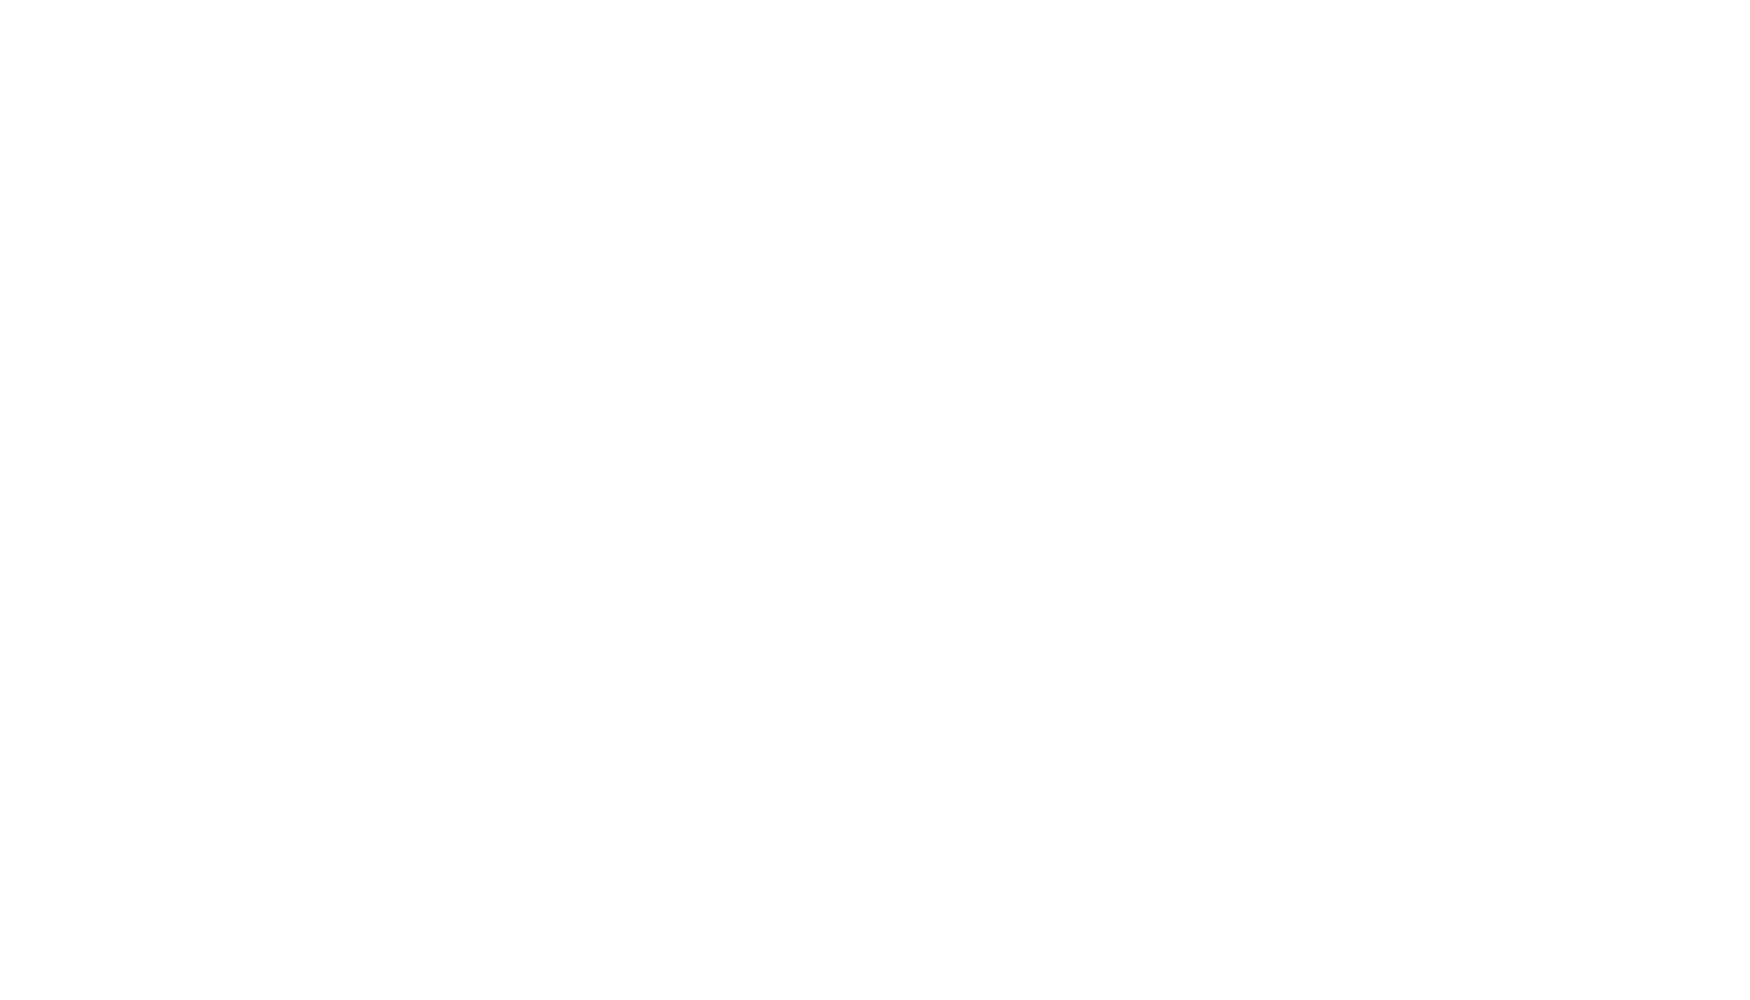 Rhode Island Chamber Music Concerts   Classical Music in RI